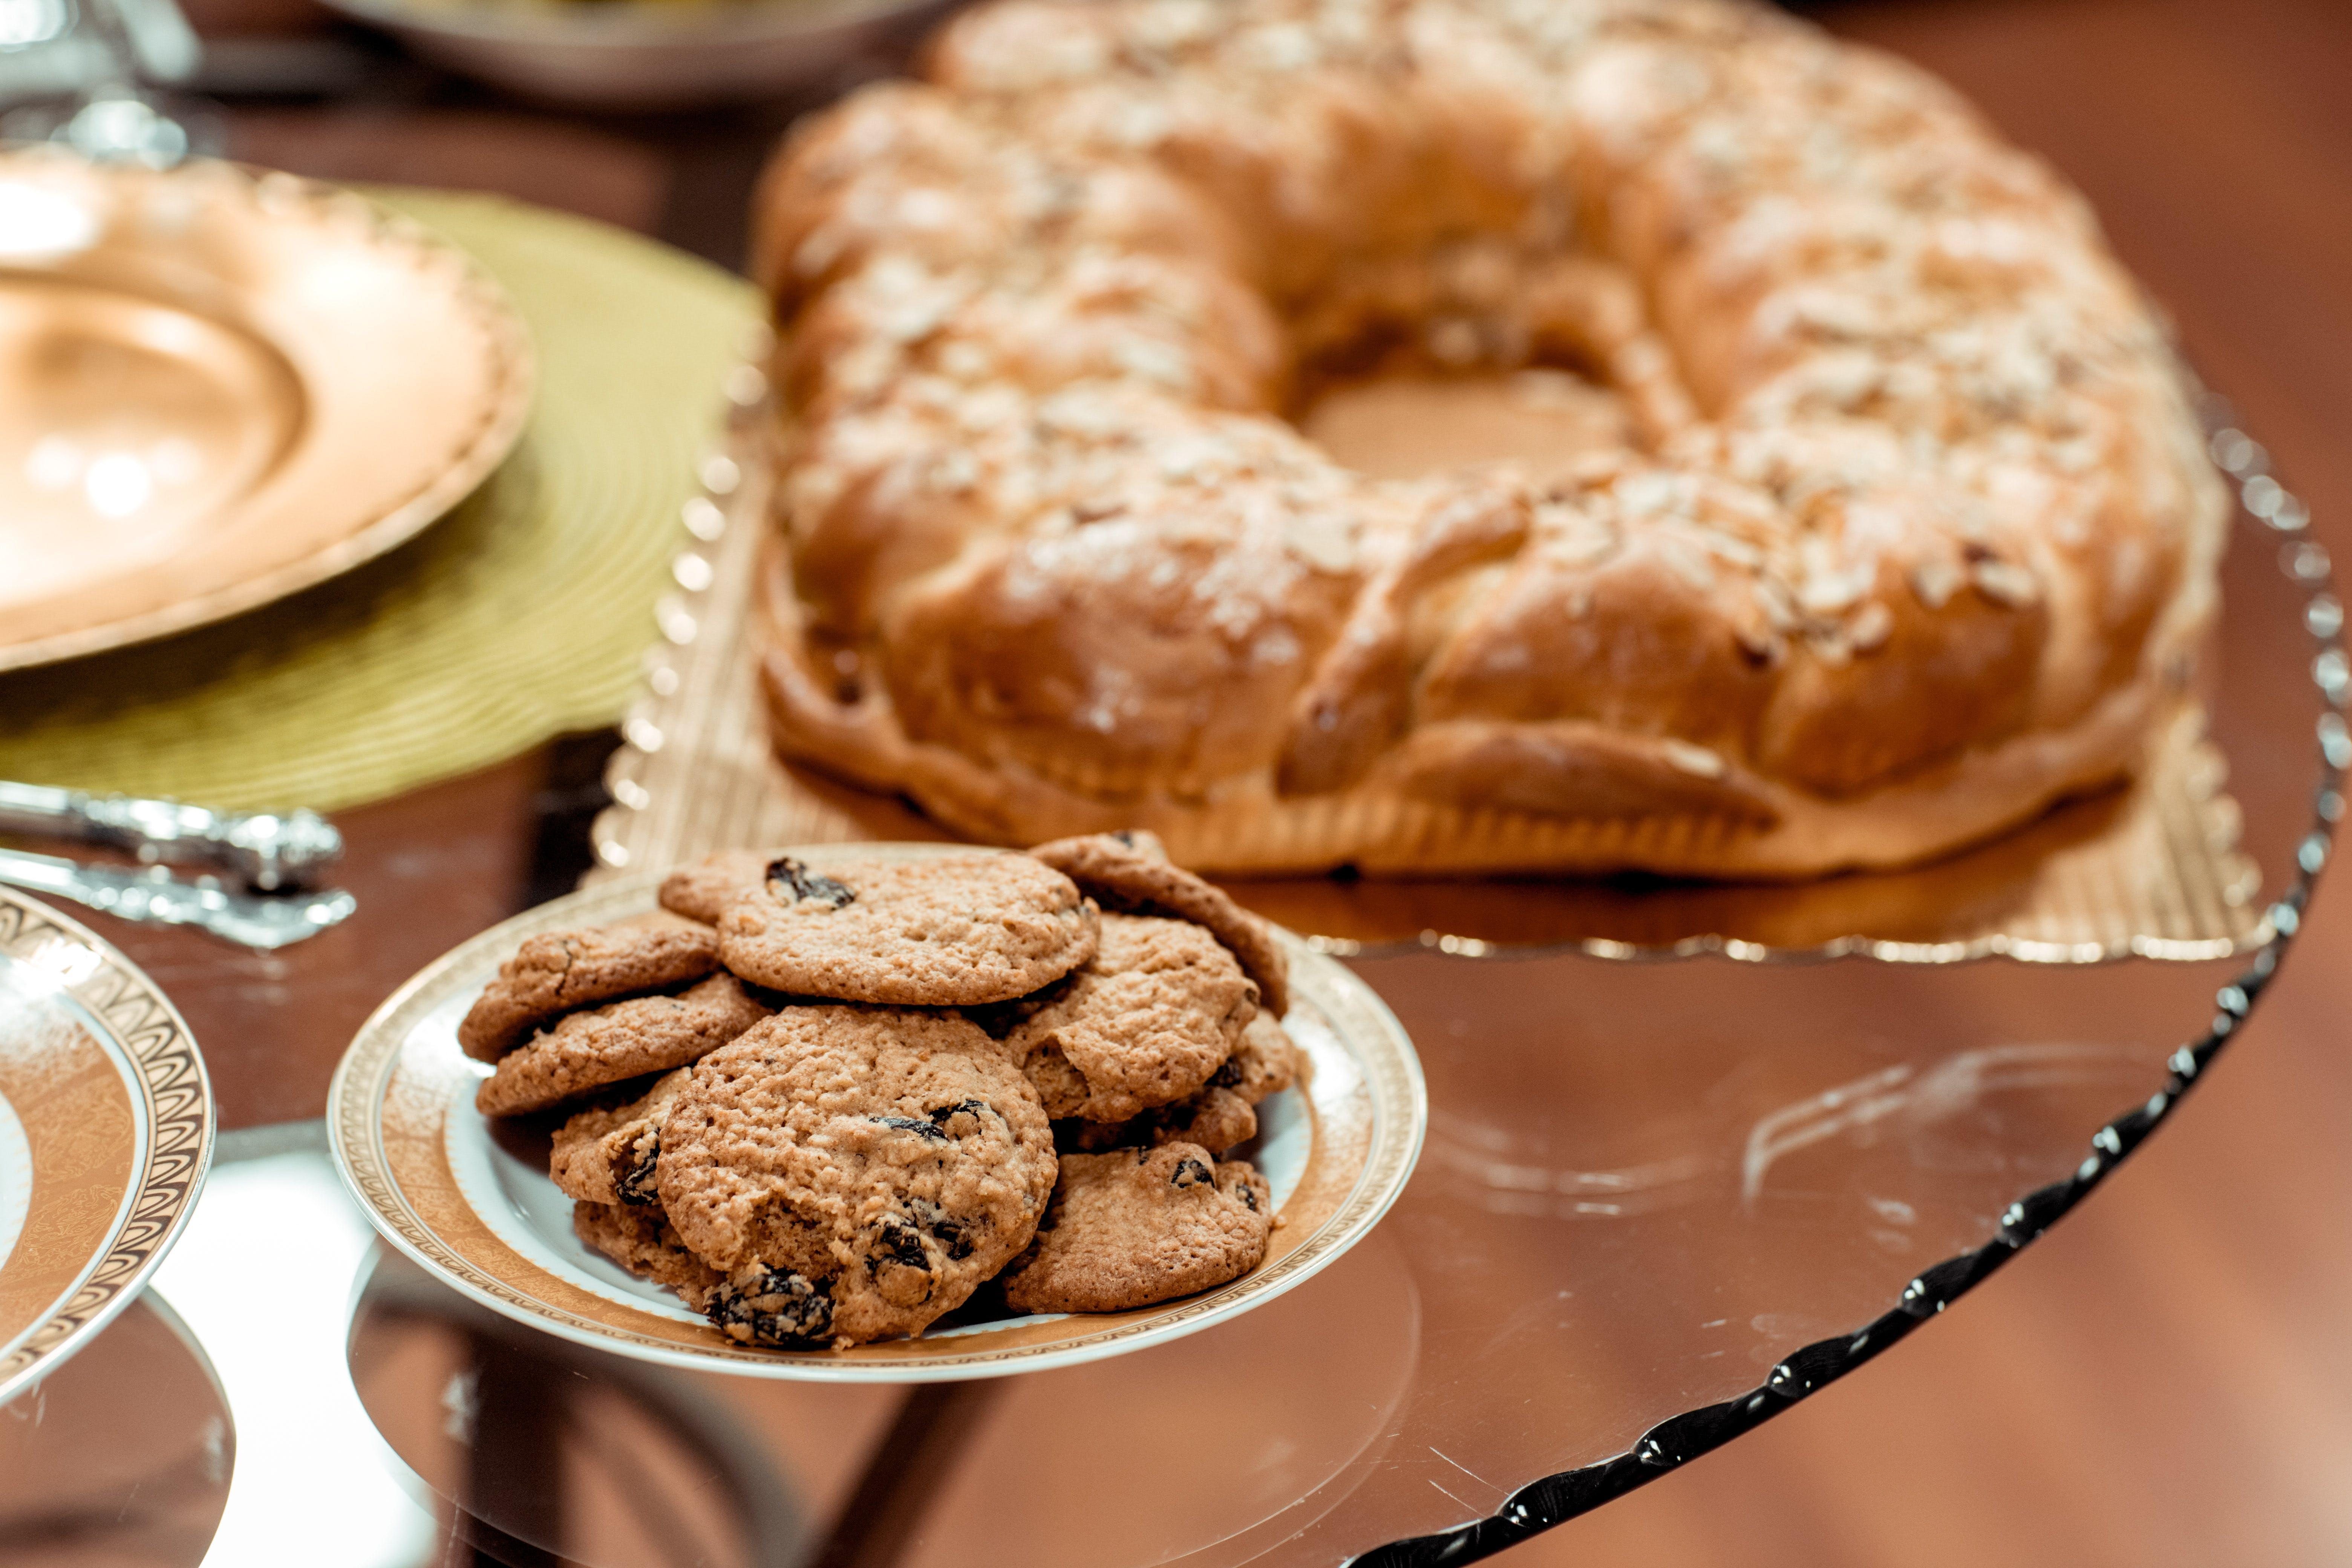 Cookies on Plate on Table